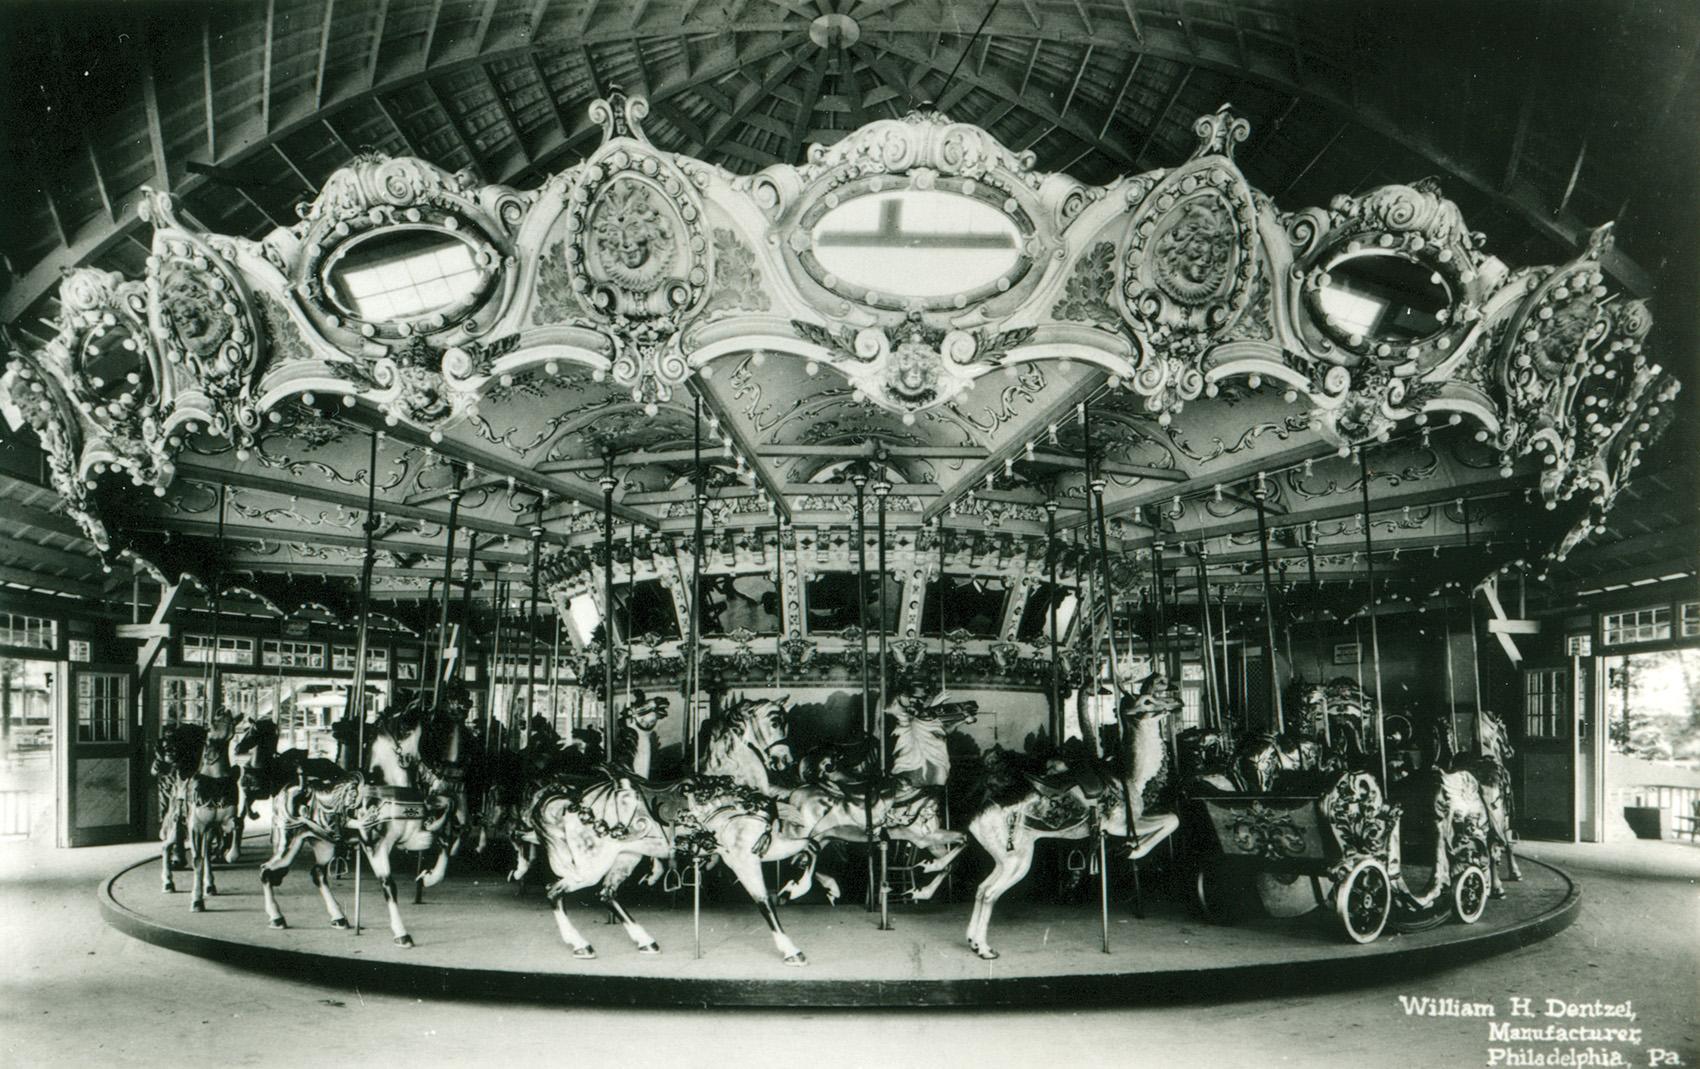 Ca-1920s-Wm-Dentzel-carousel-deluxe-menagerie-archive